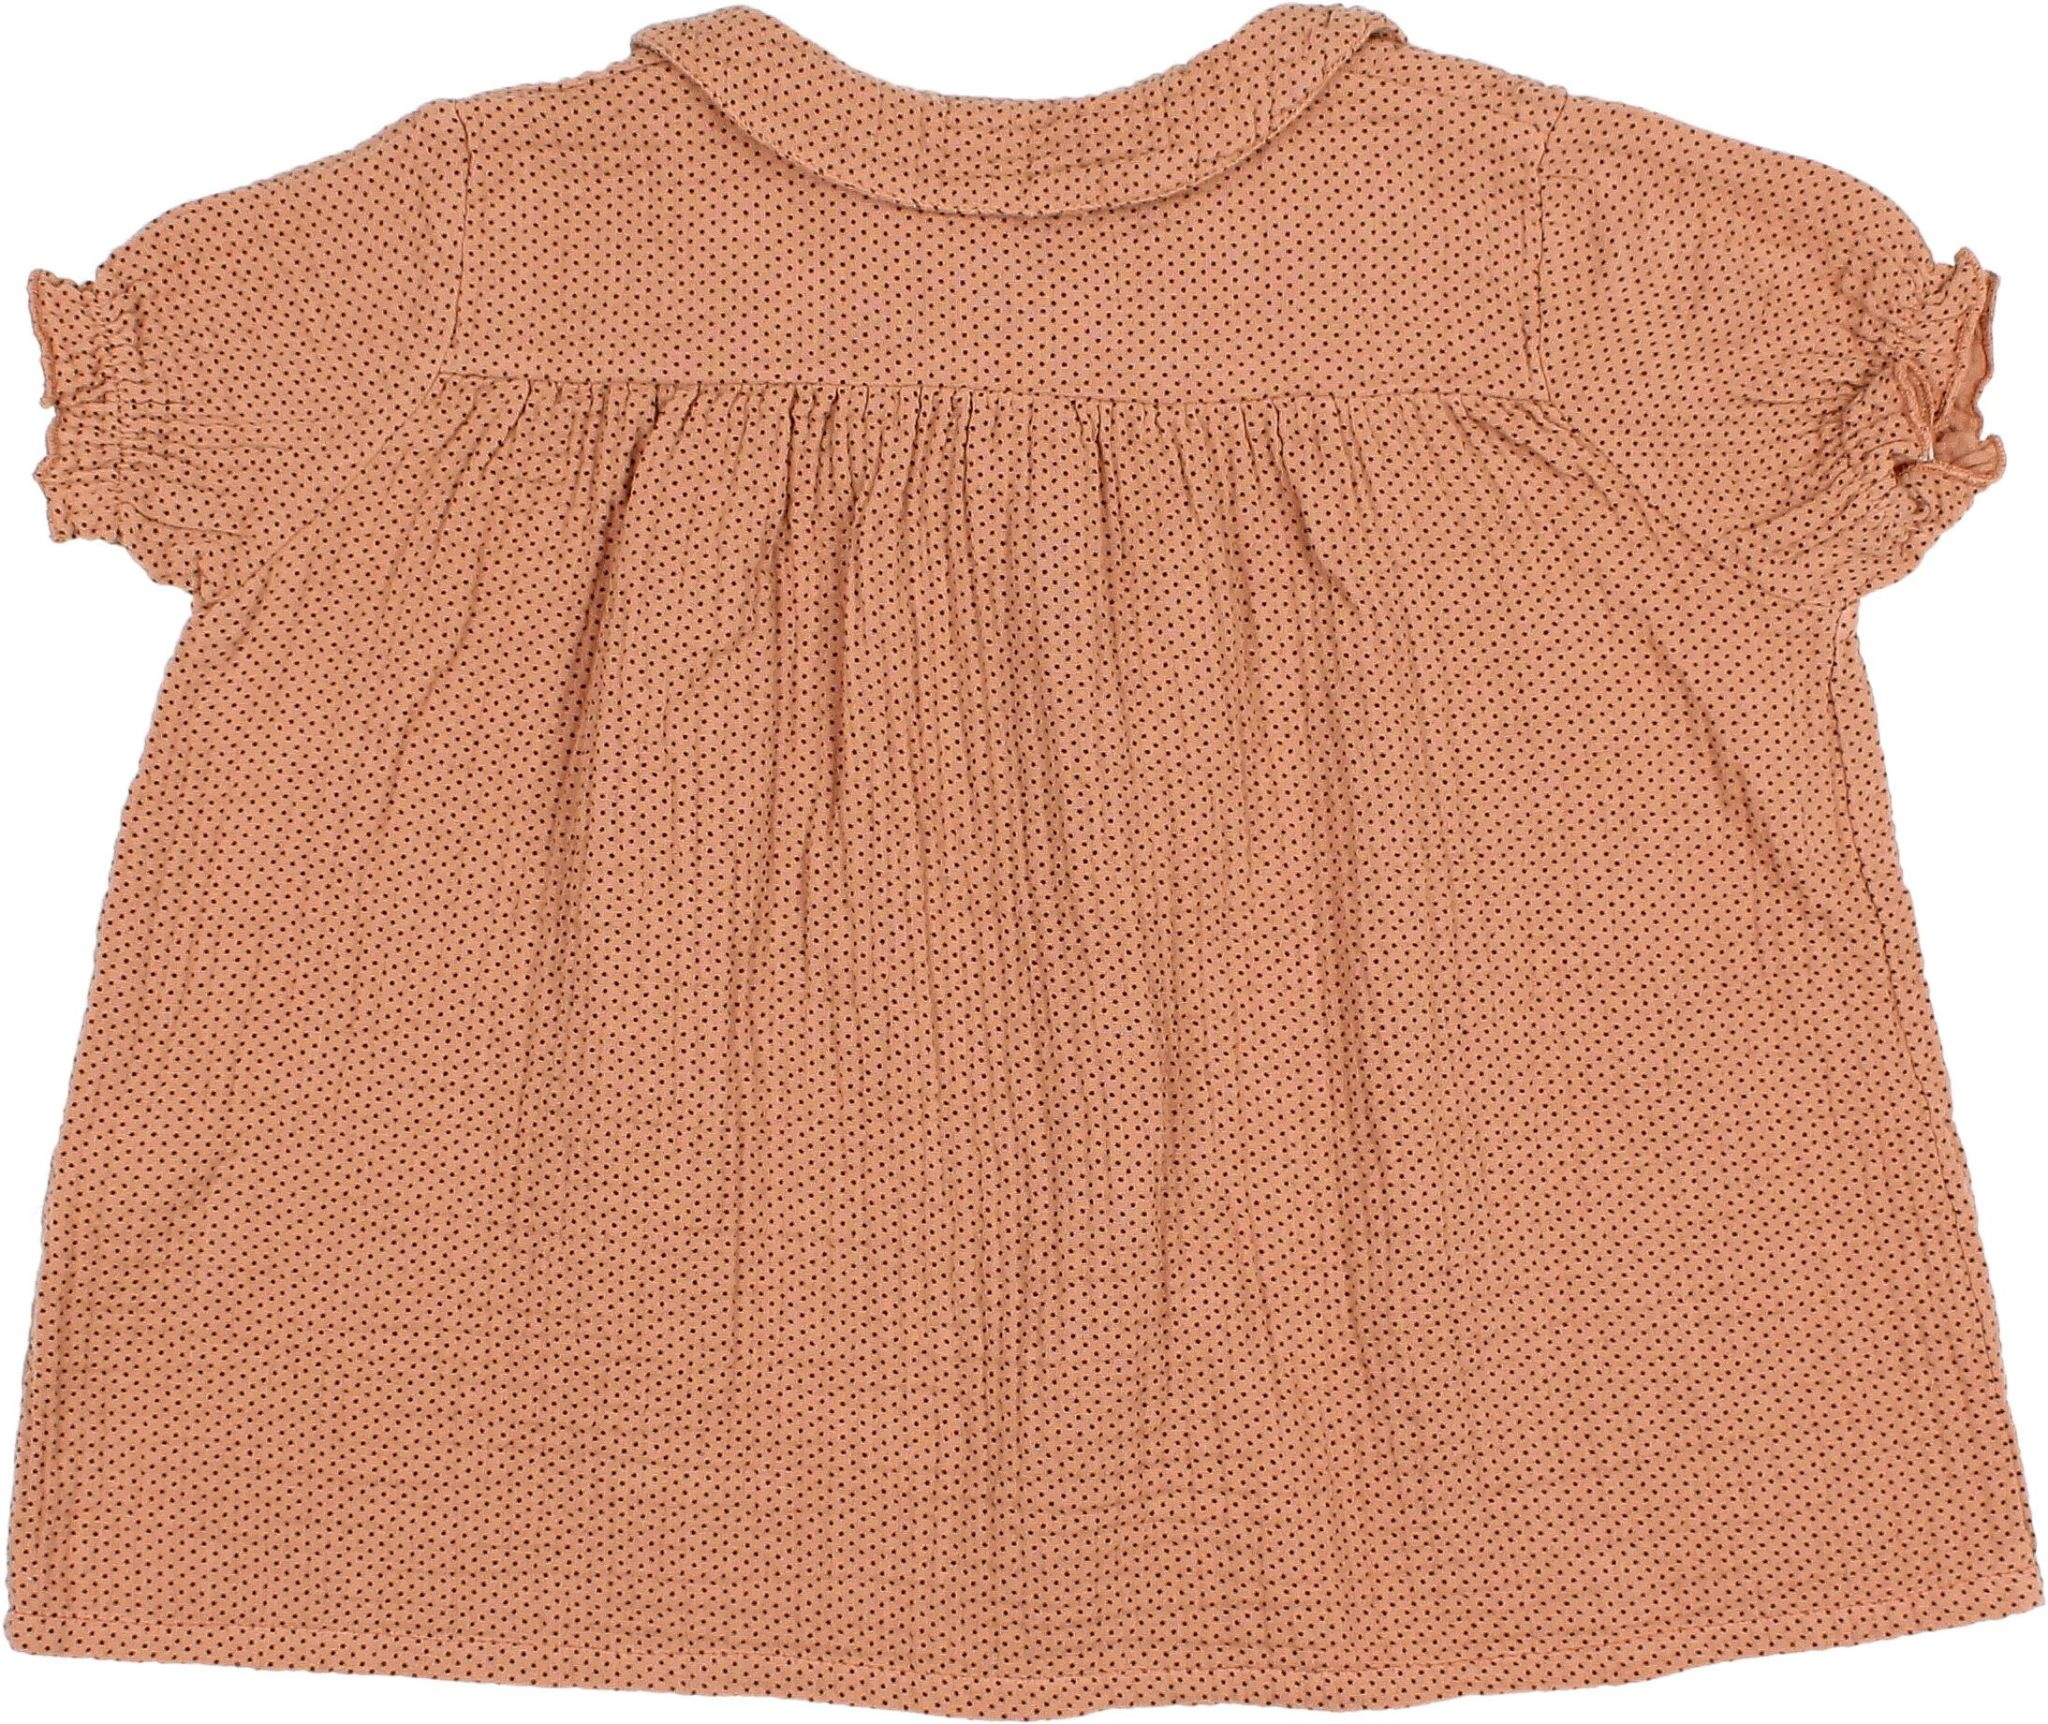 Buho Buho - 9204 Dots blouse Dark siena